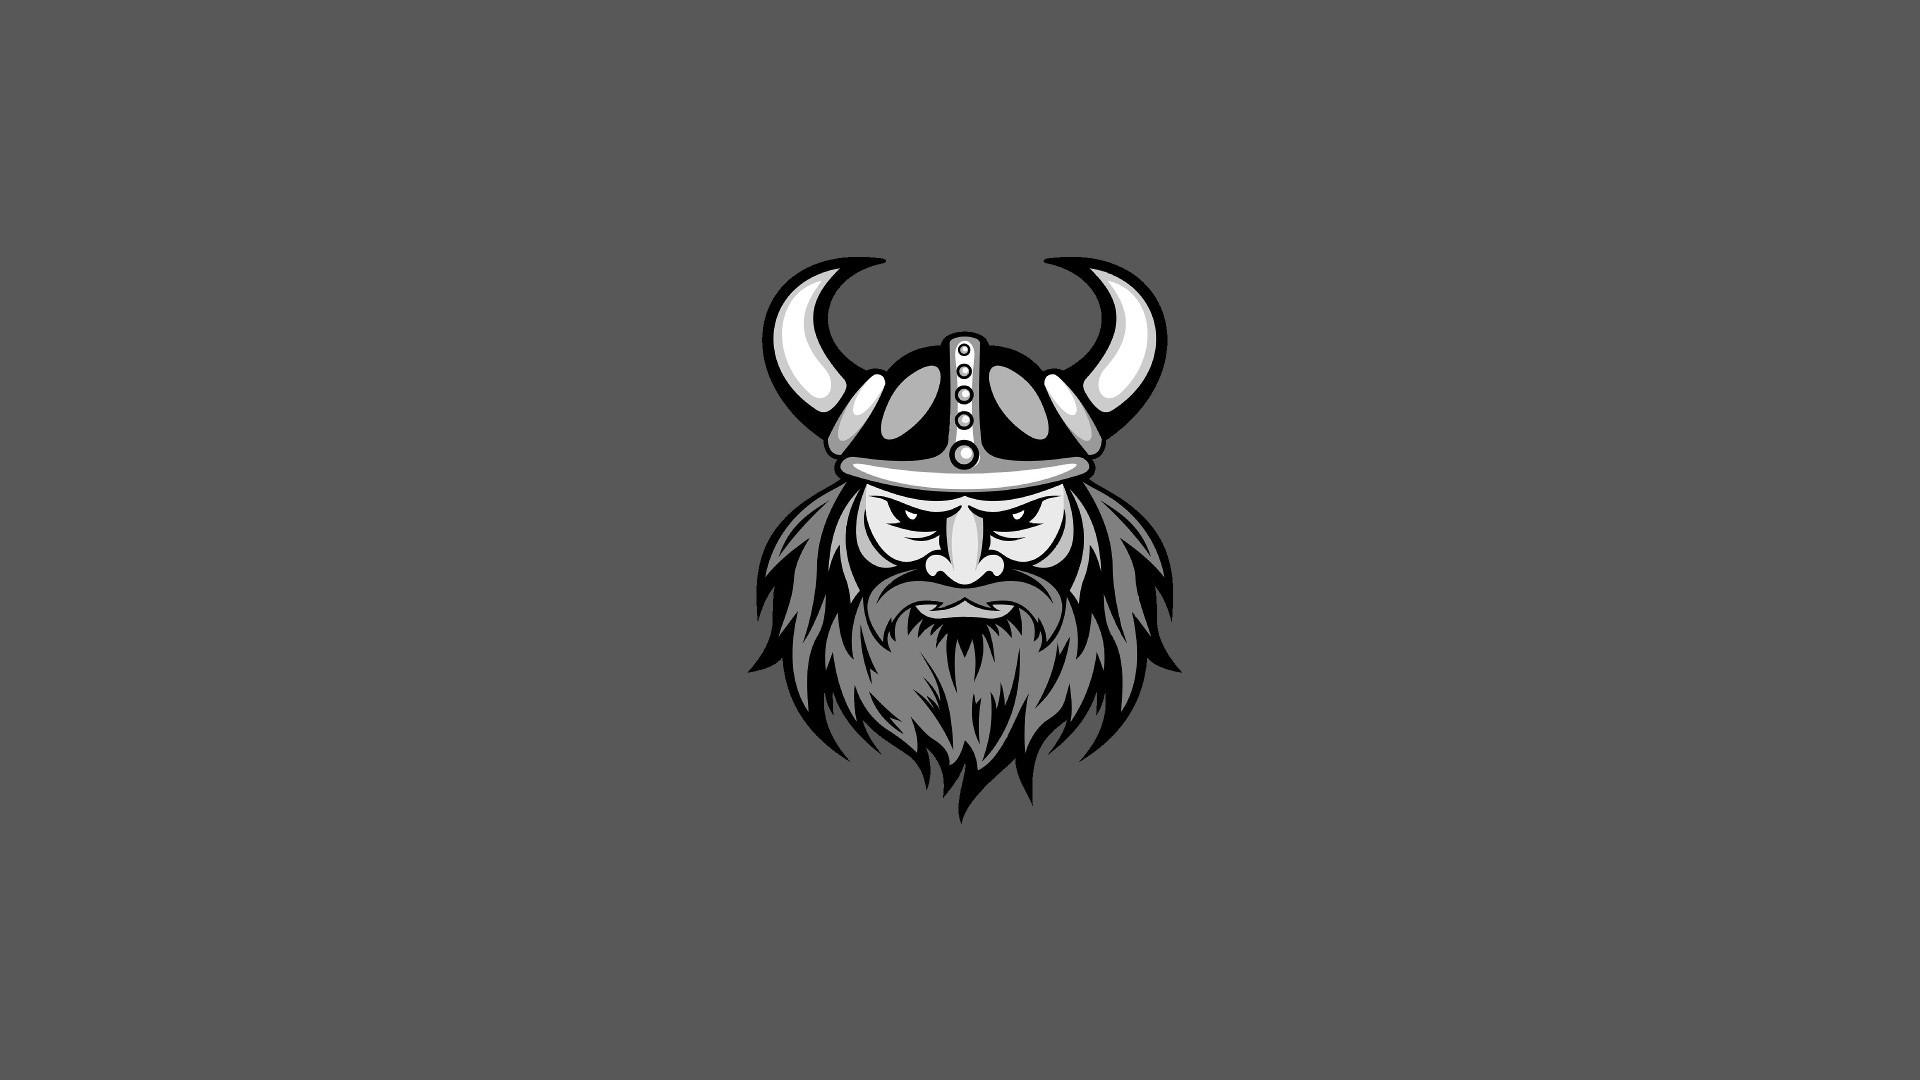 Vikings minimalism hd tv shows 4k wallpapers images vikings minimalism voltagebd Images